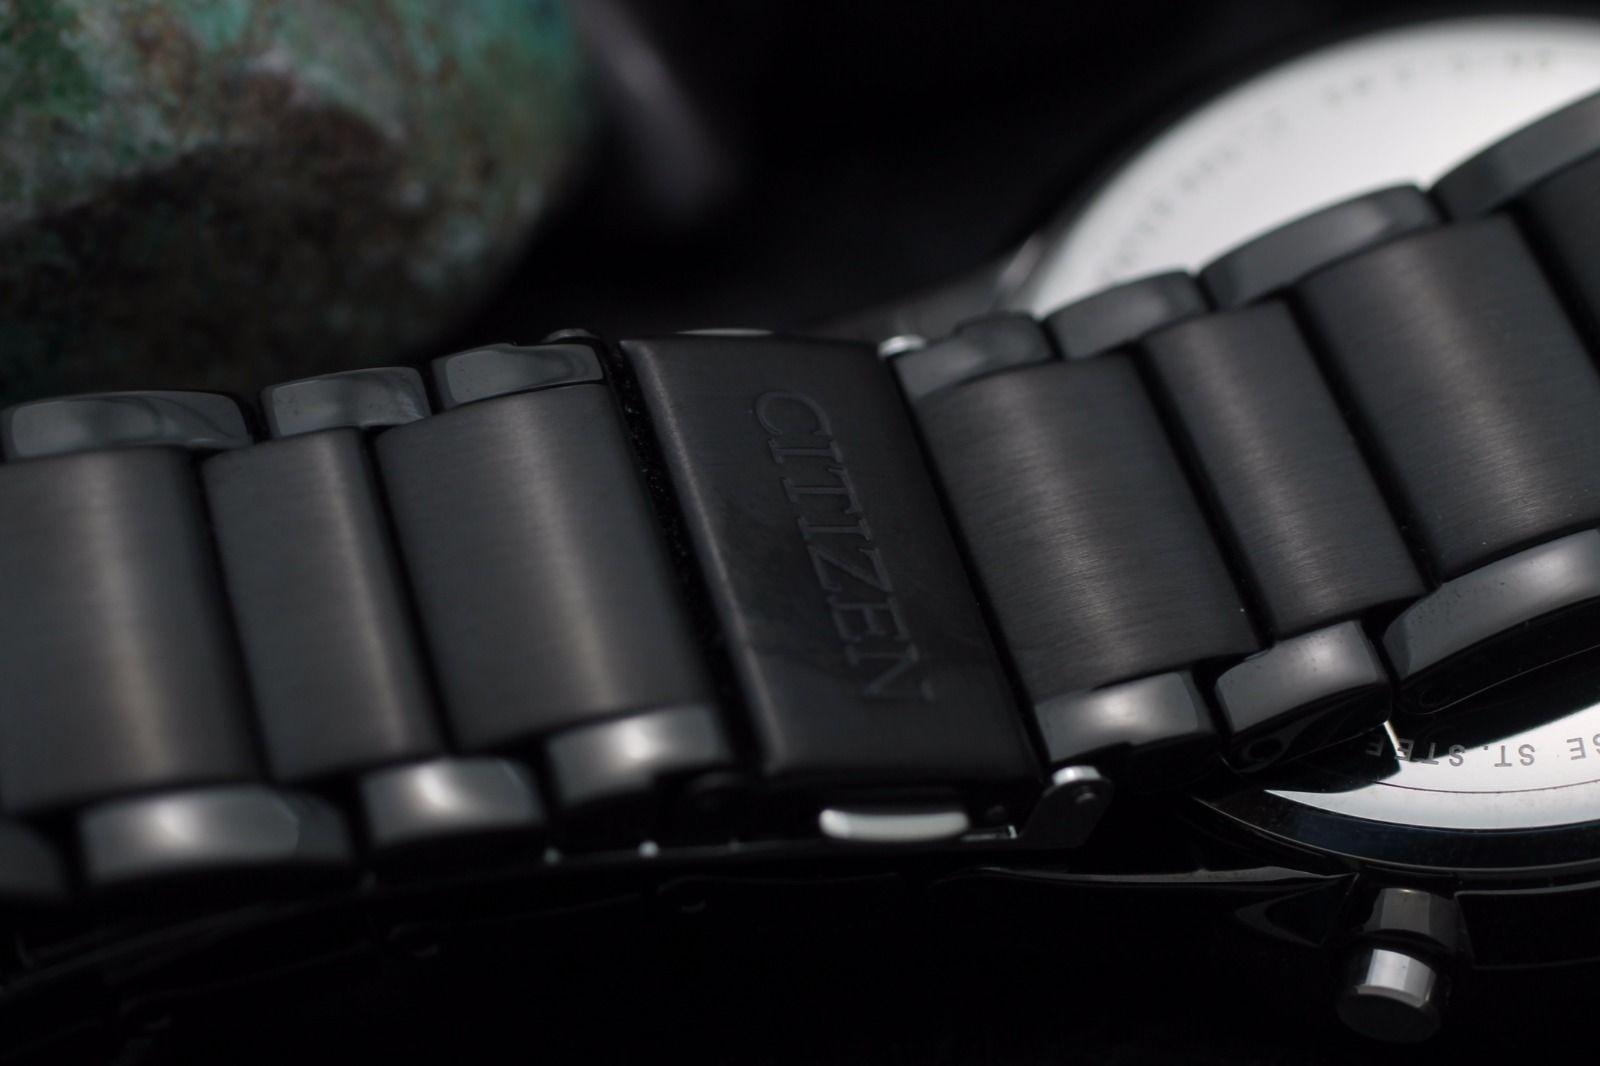 Mens Citizen Eco Drive Chronograph Black Pvd H504 Dress Watch Full Ca4285 50h Product Description